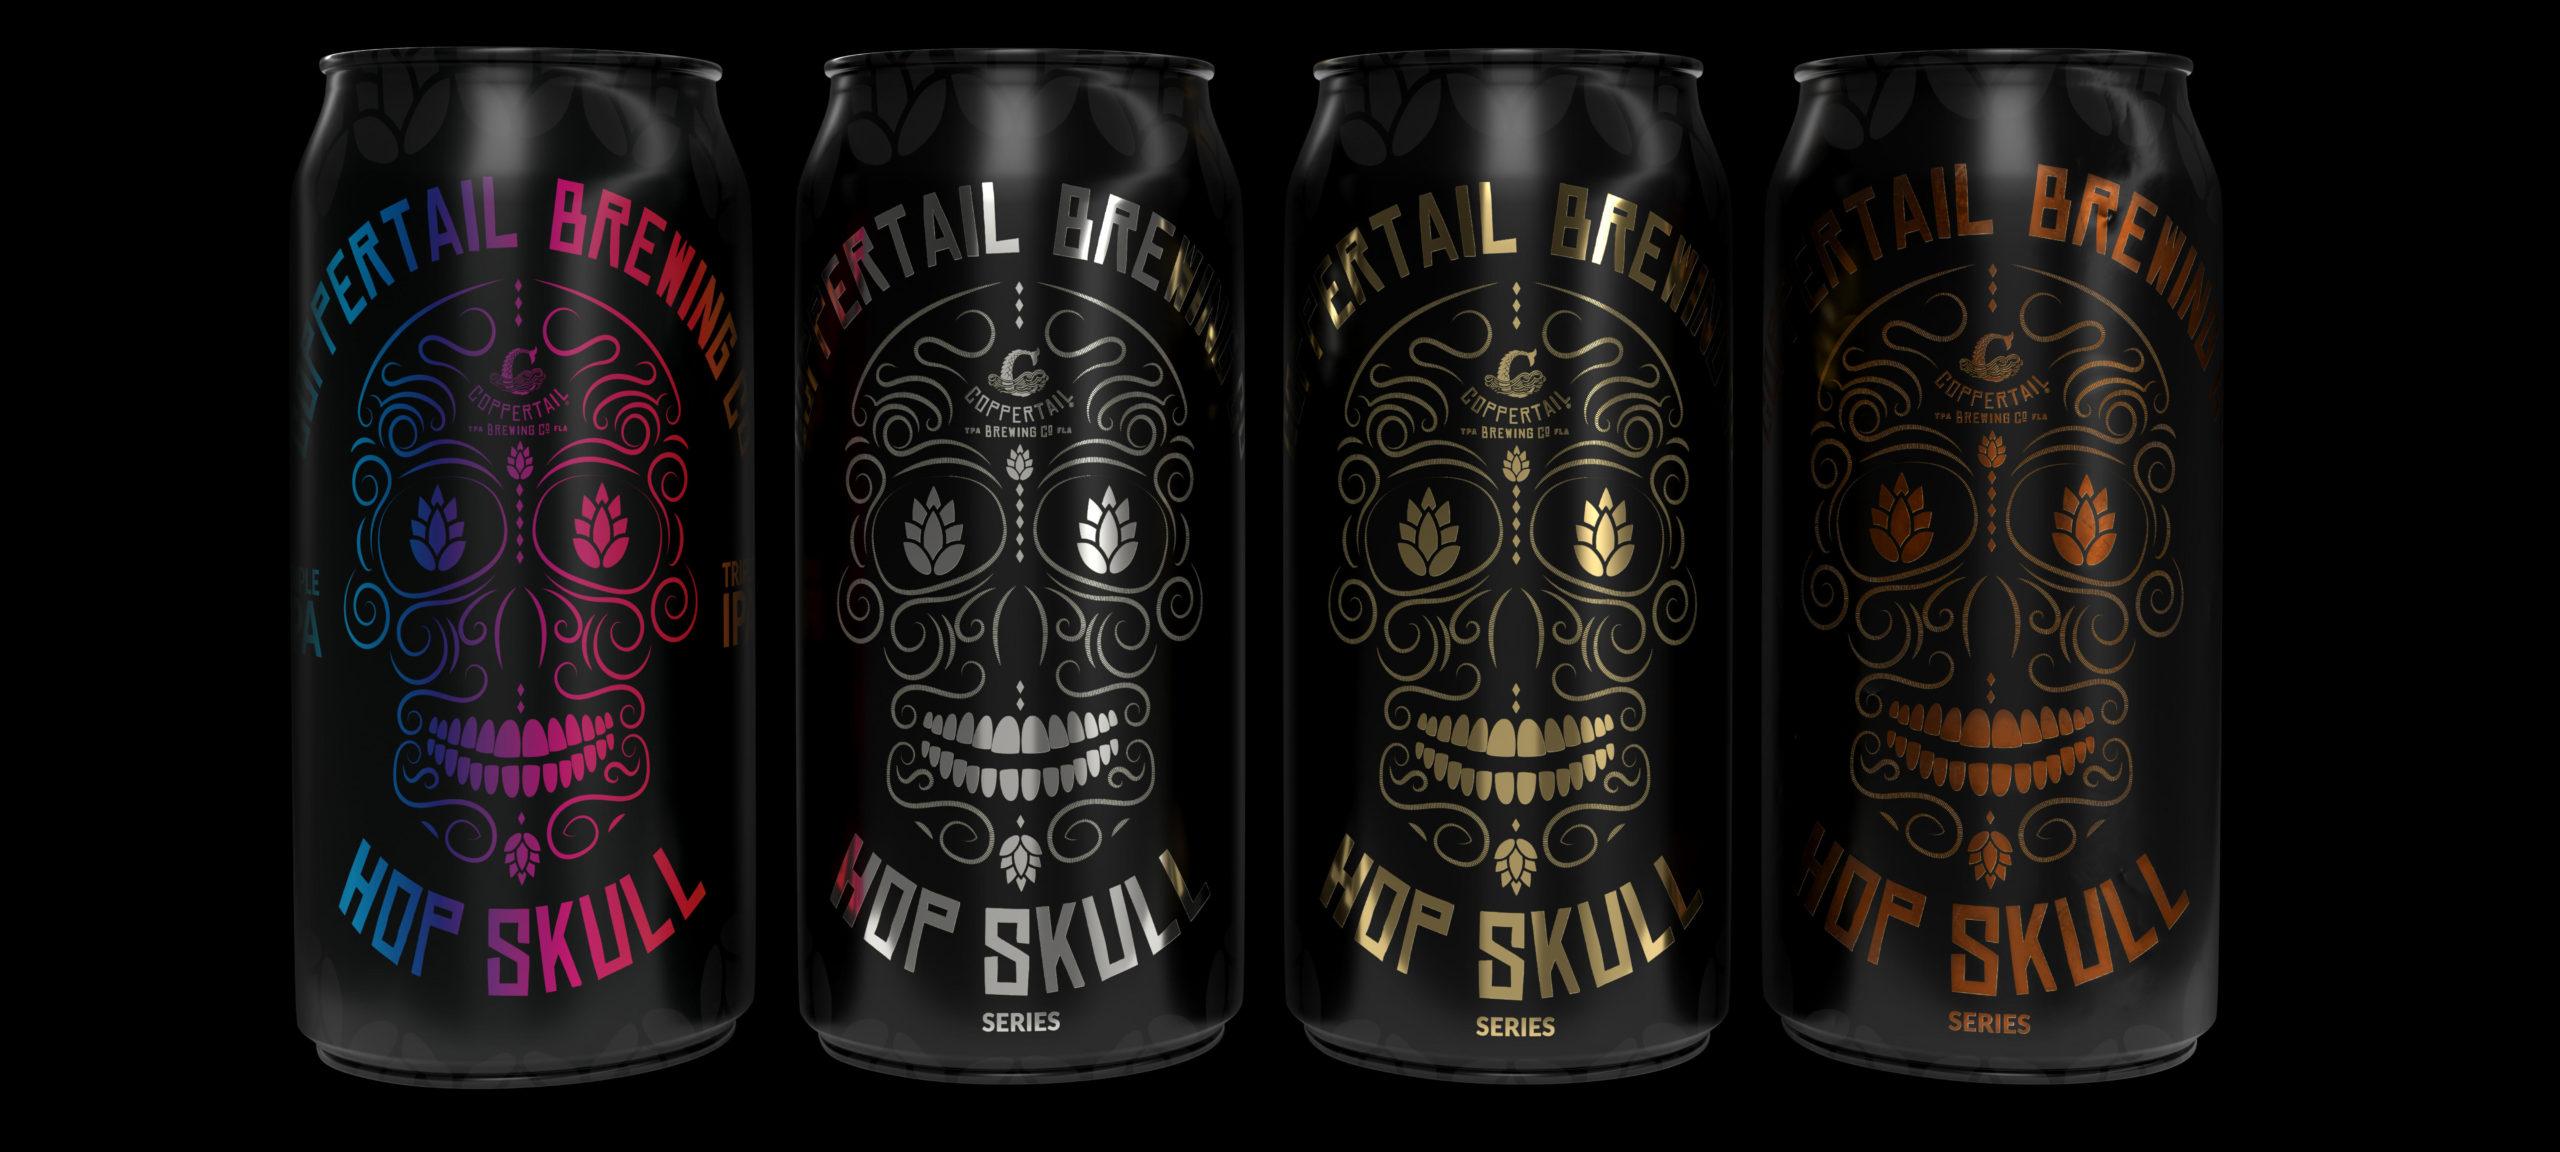 Coppertail Brewing Hop Skull Series Pics